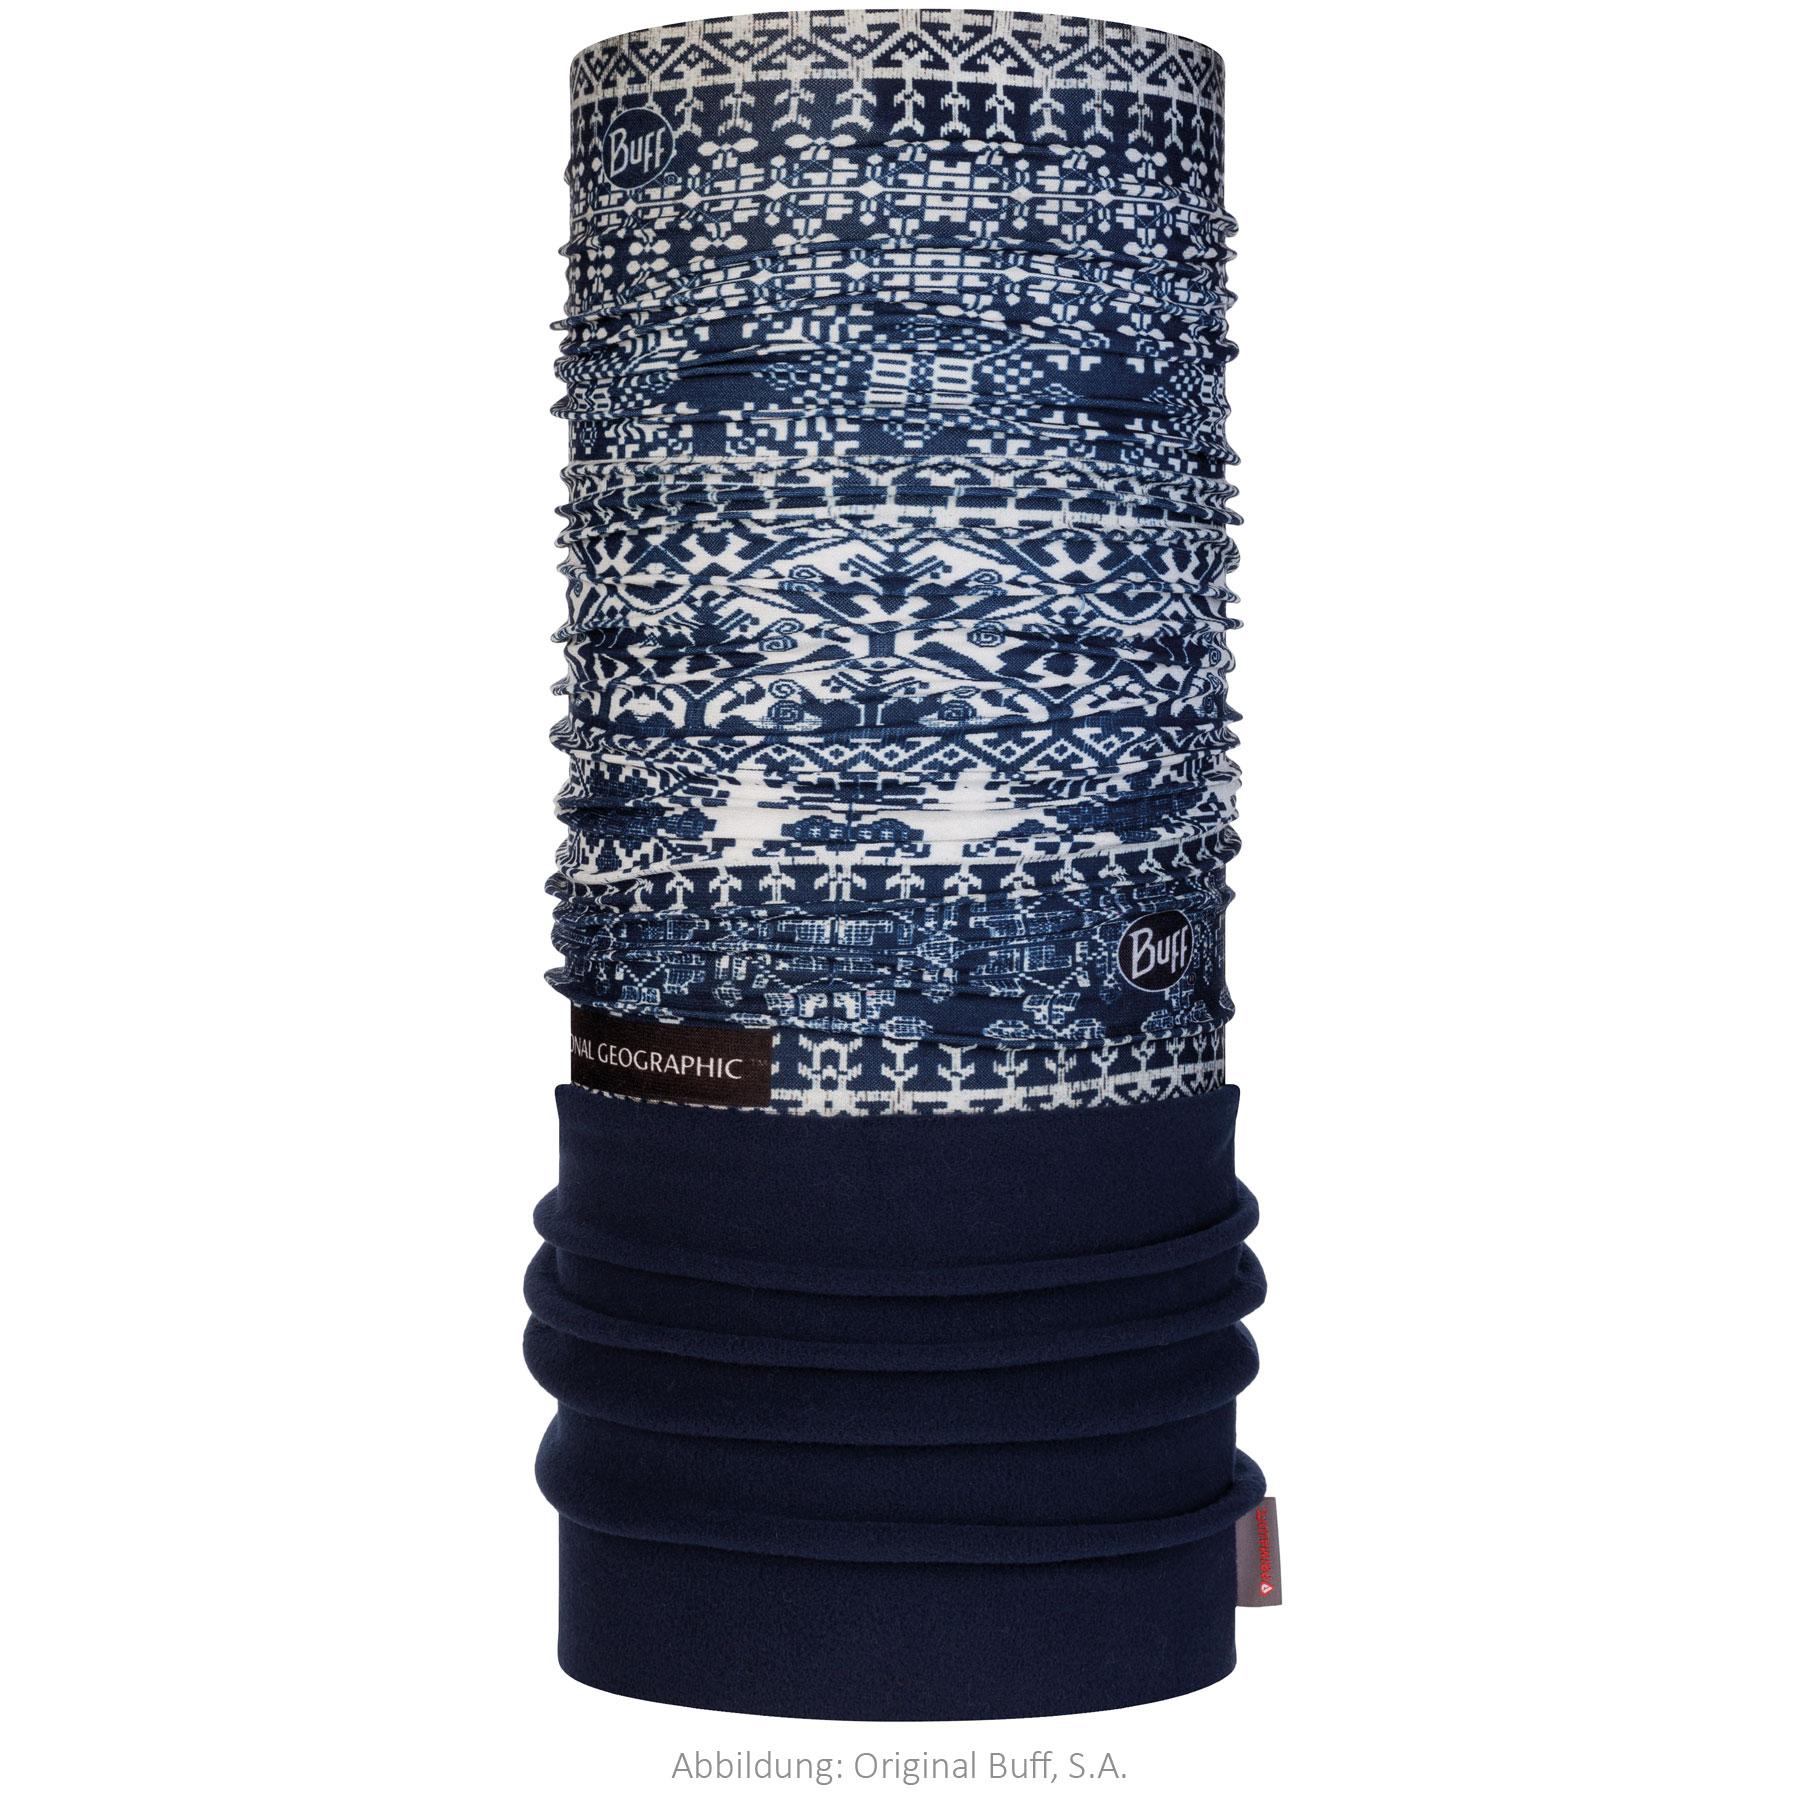 Image of Buff® Polar Licensed Multifunctional Cloth - Kurzeme Dark Navy